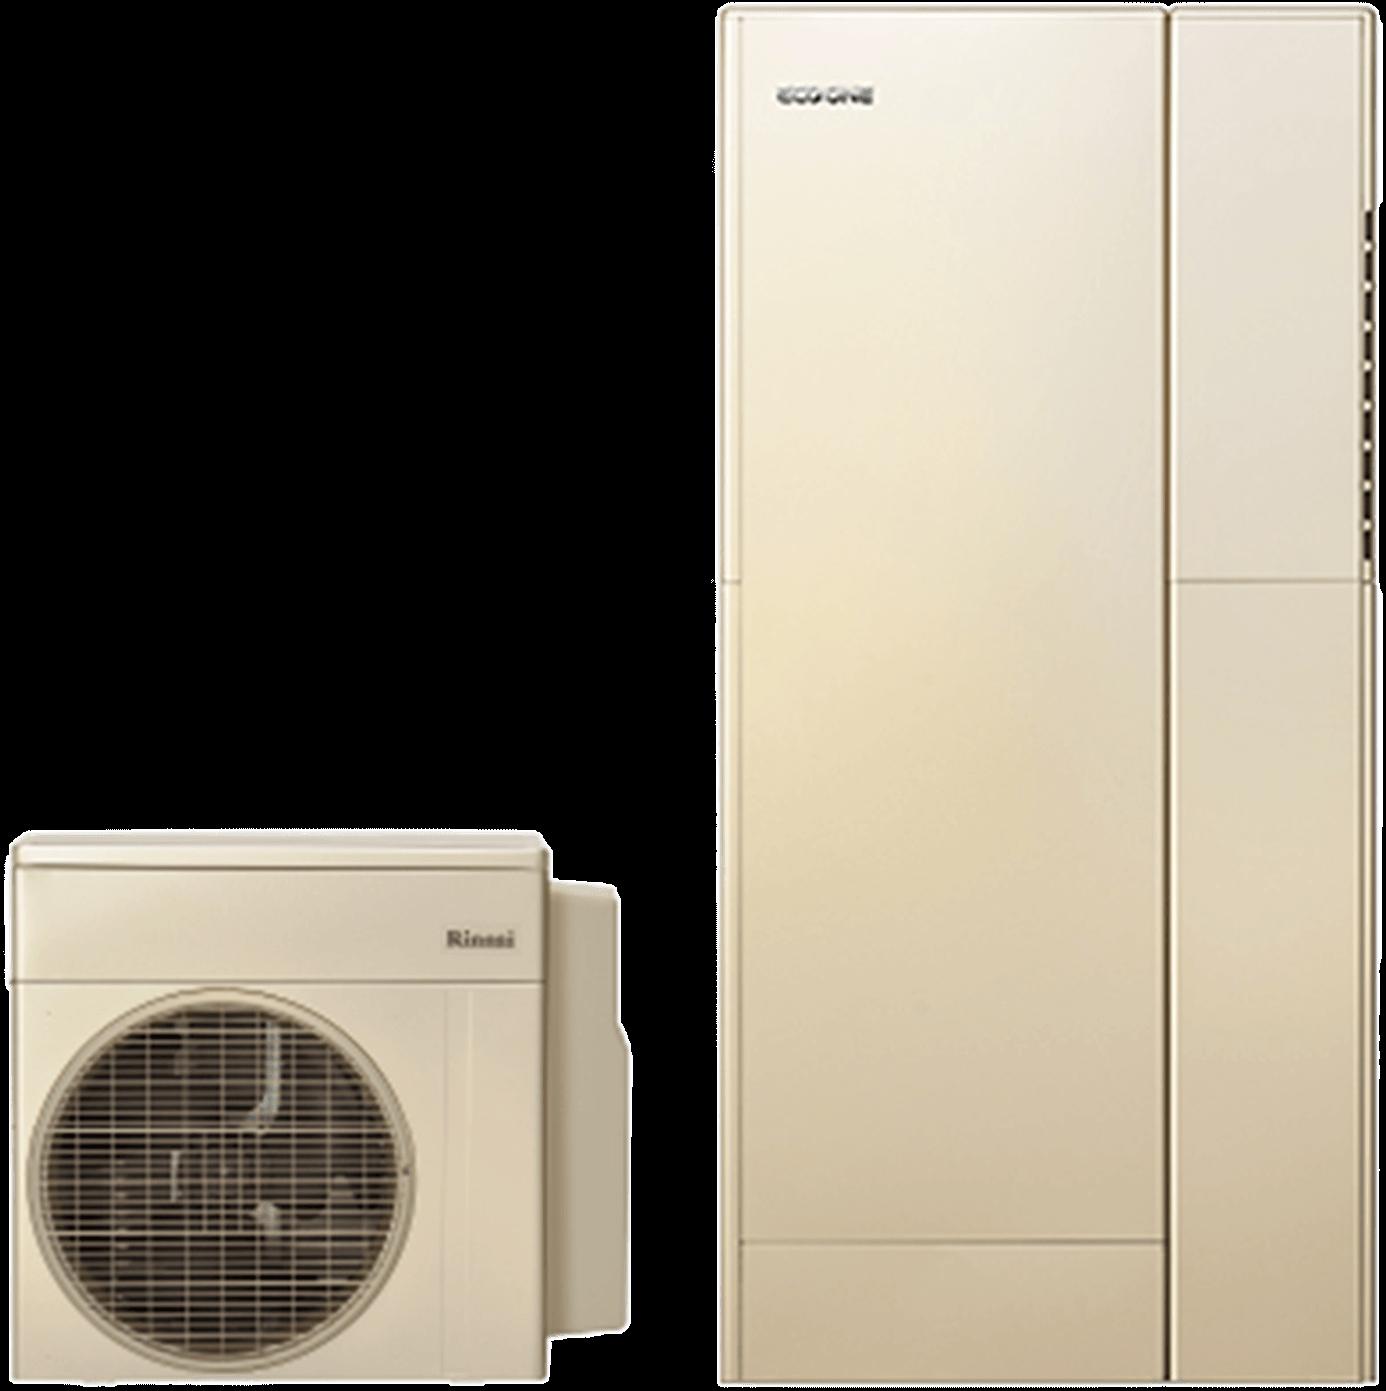 ECO ONE エコワン 160リットル ダブルハイブリッド給湯・暖房システム